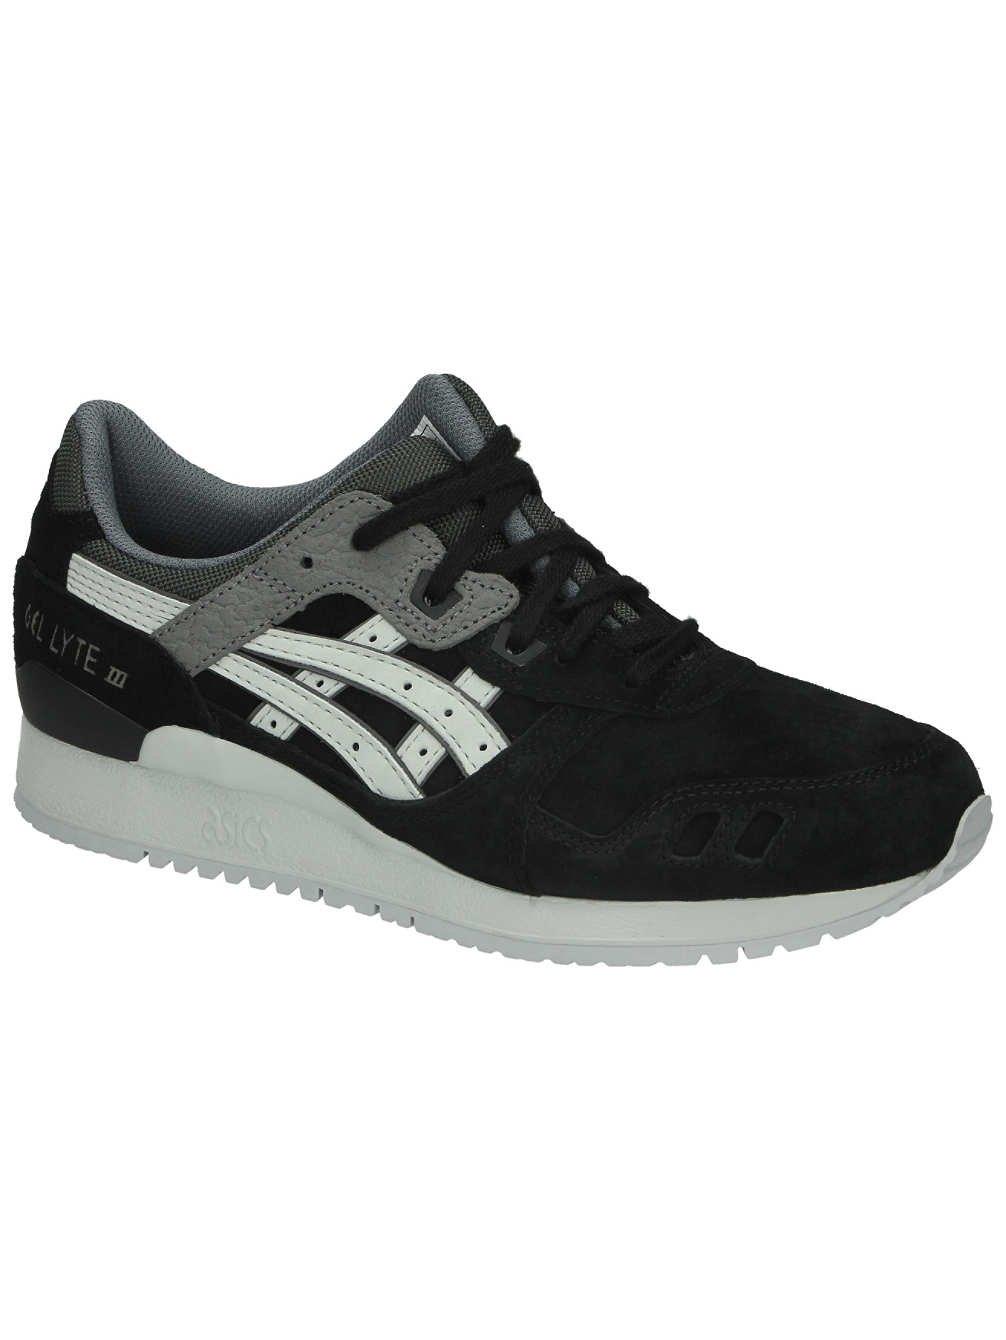 Asics Gel Lyte III Black/Soft Grey HL6B19010, Deportivas 39 EU|Noir